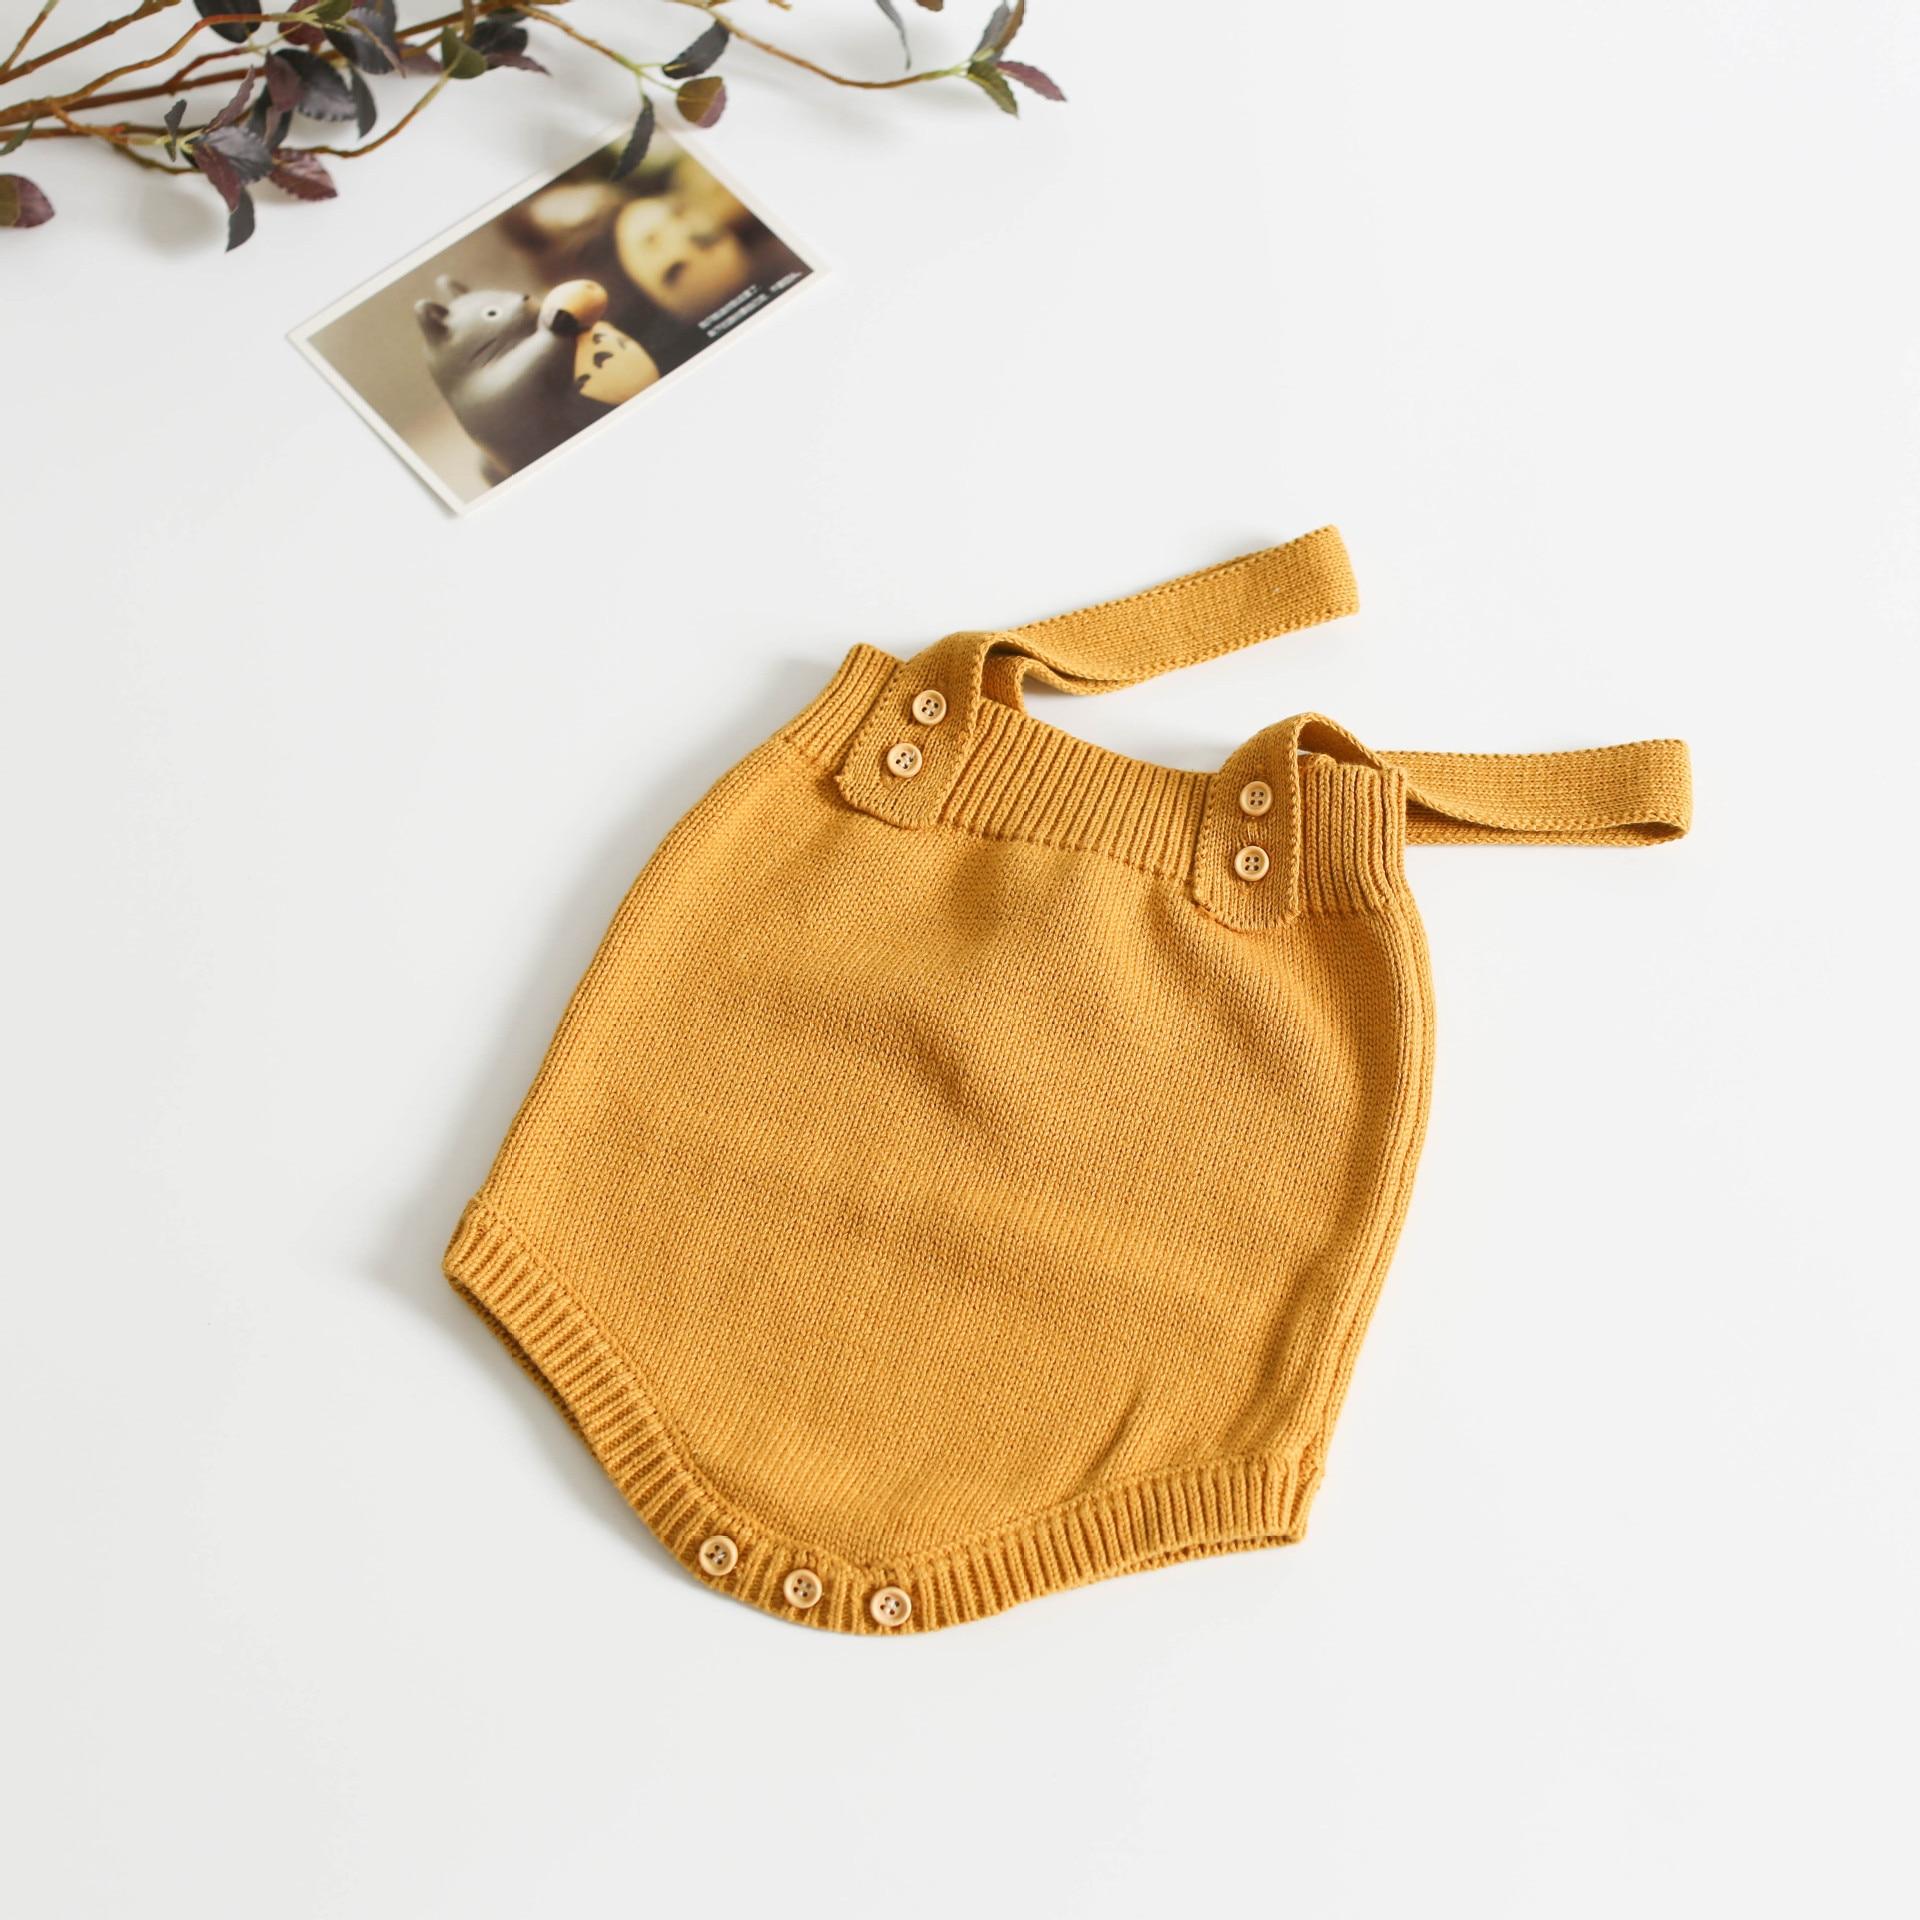 H671d8e6e391a4ff9910d7f54933fcb2cy Baby Knitting Rompers Cute Overalls Newborn Baby Girls Boys Clothes Infantil Baby Girl Boy Sleeveless Romper Jumpsuit 0-24m